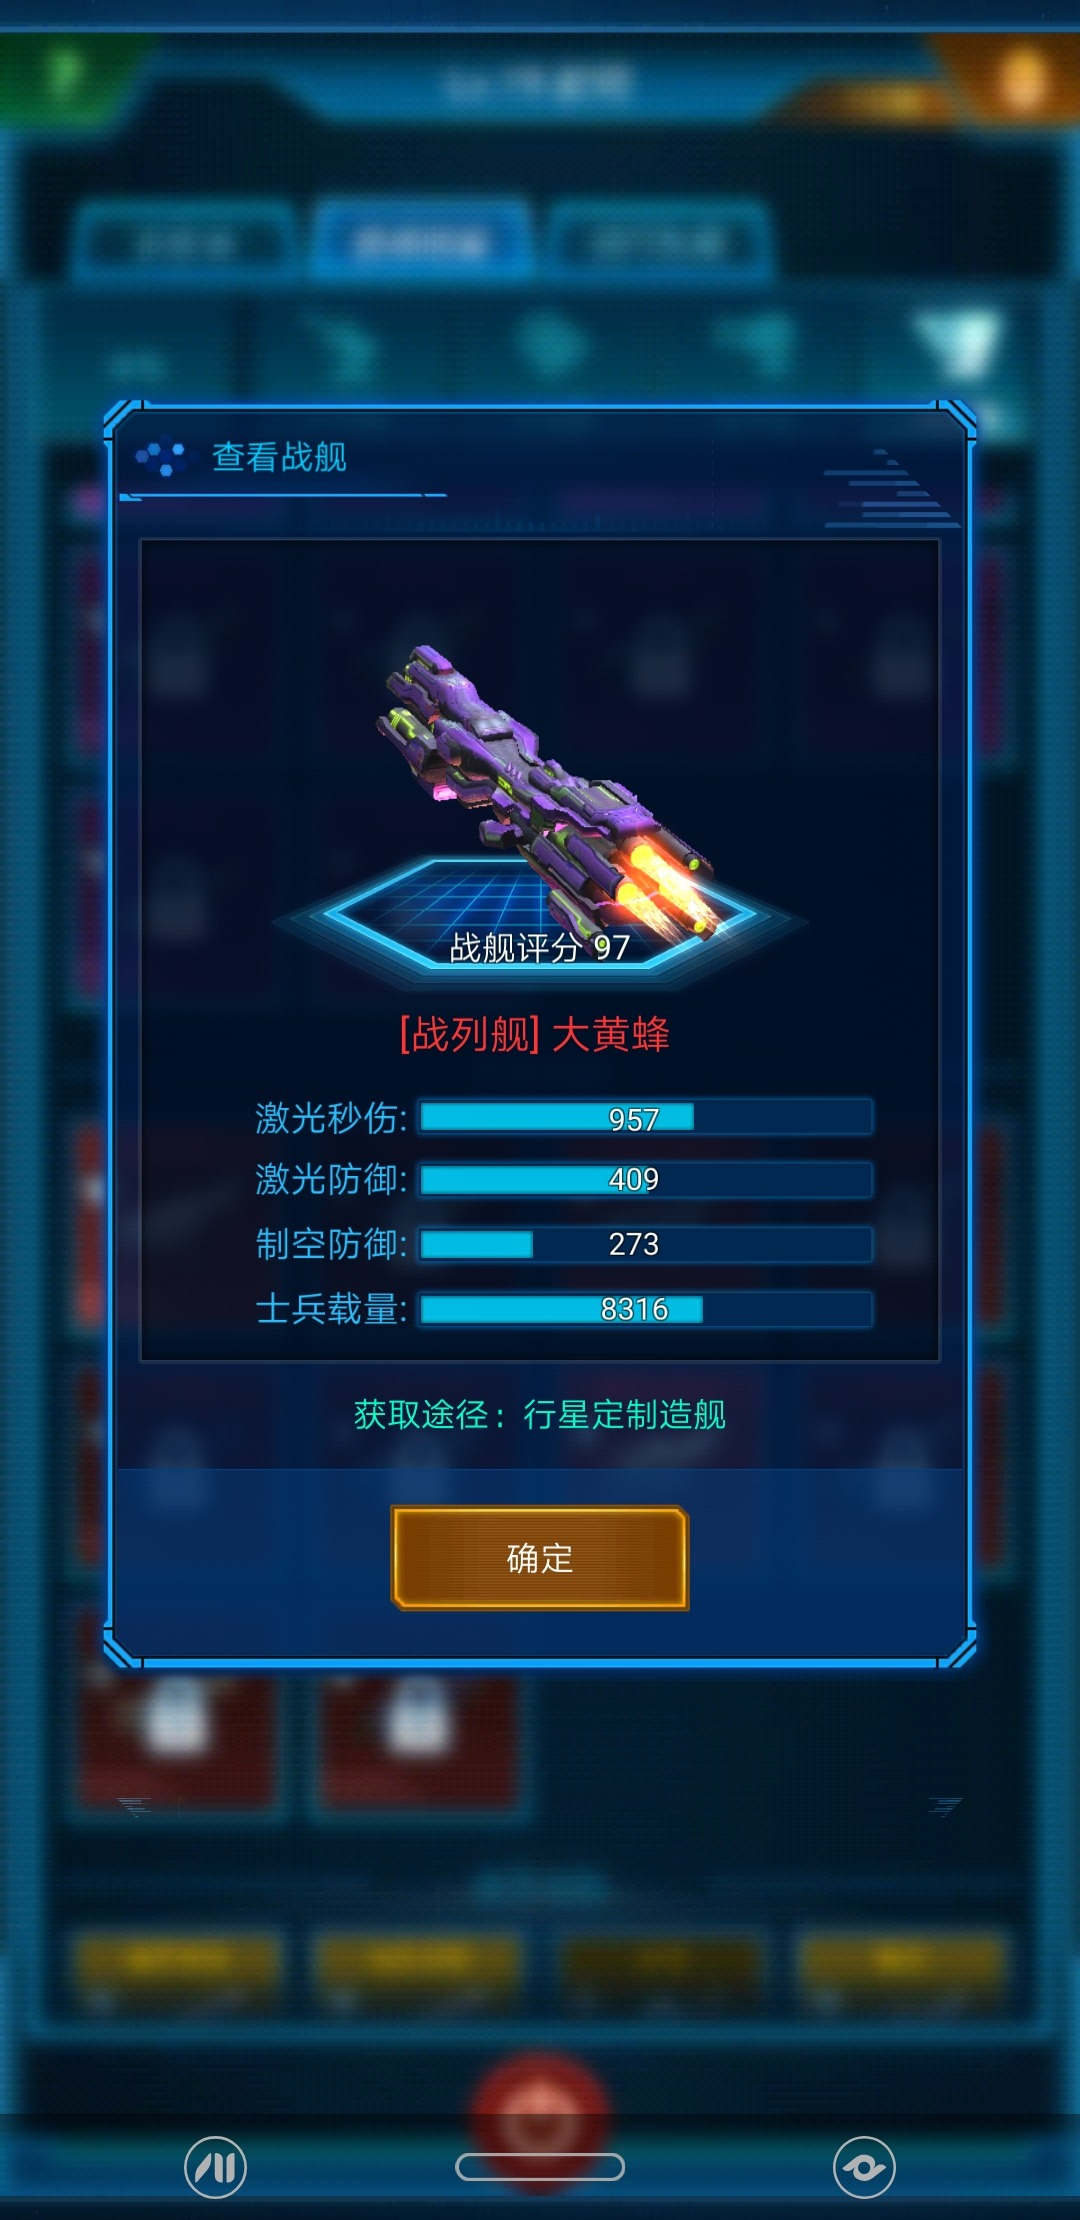 Screenshot_20190810_072217_com.jedigames.p16s.huawei.jpg